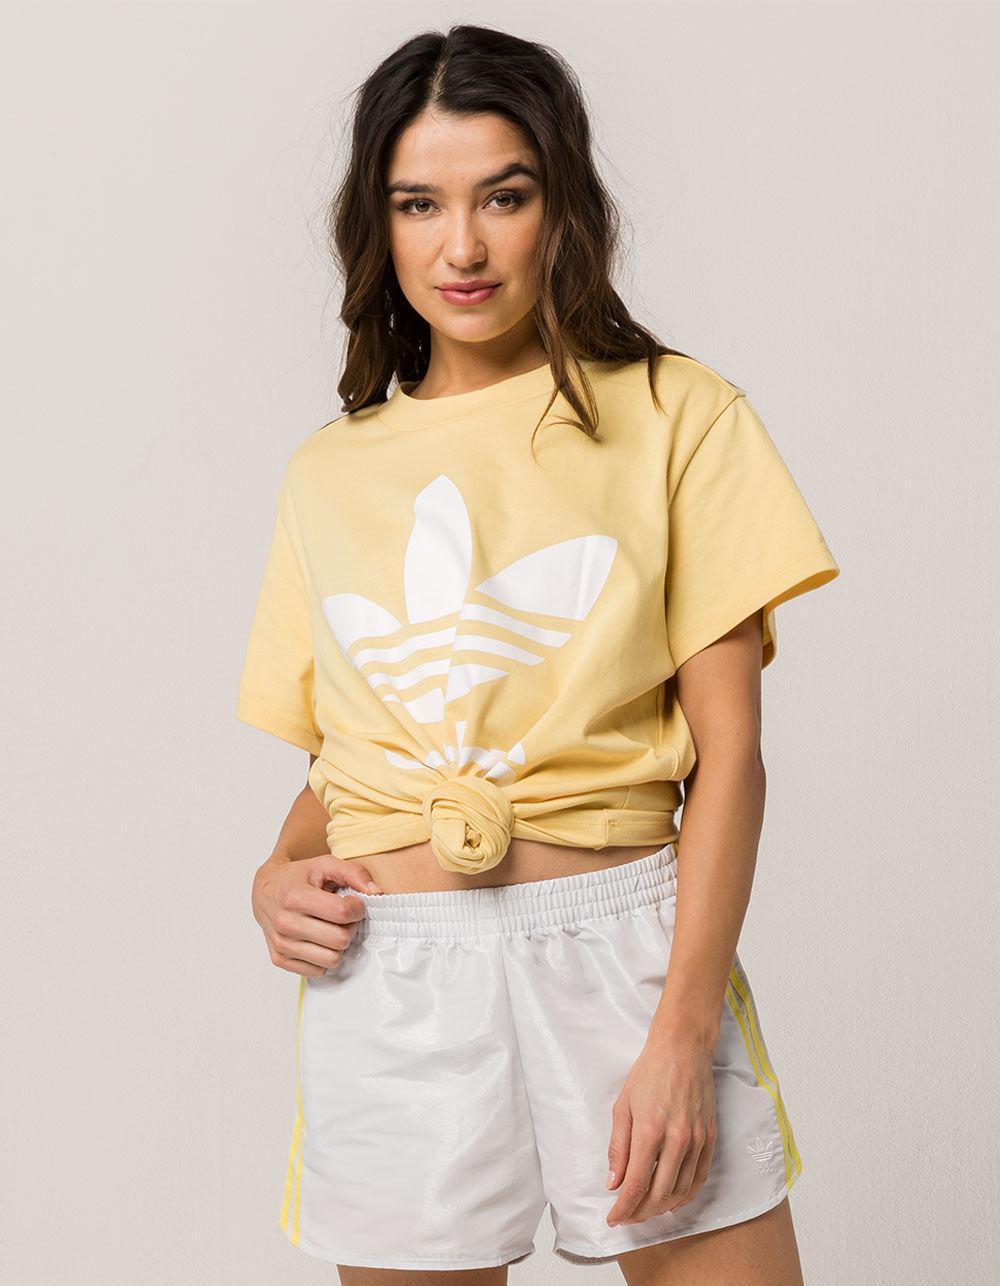 e908b873e24 adidas Big Trefoil Womens Tee in Yellow - Lyst